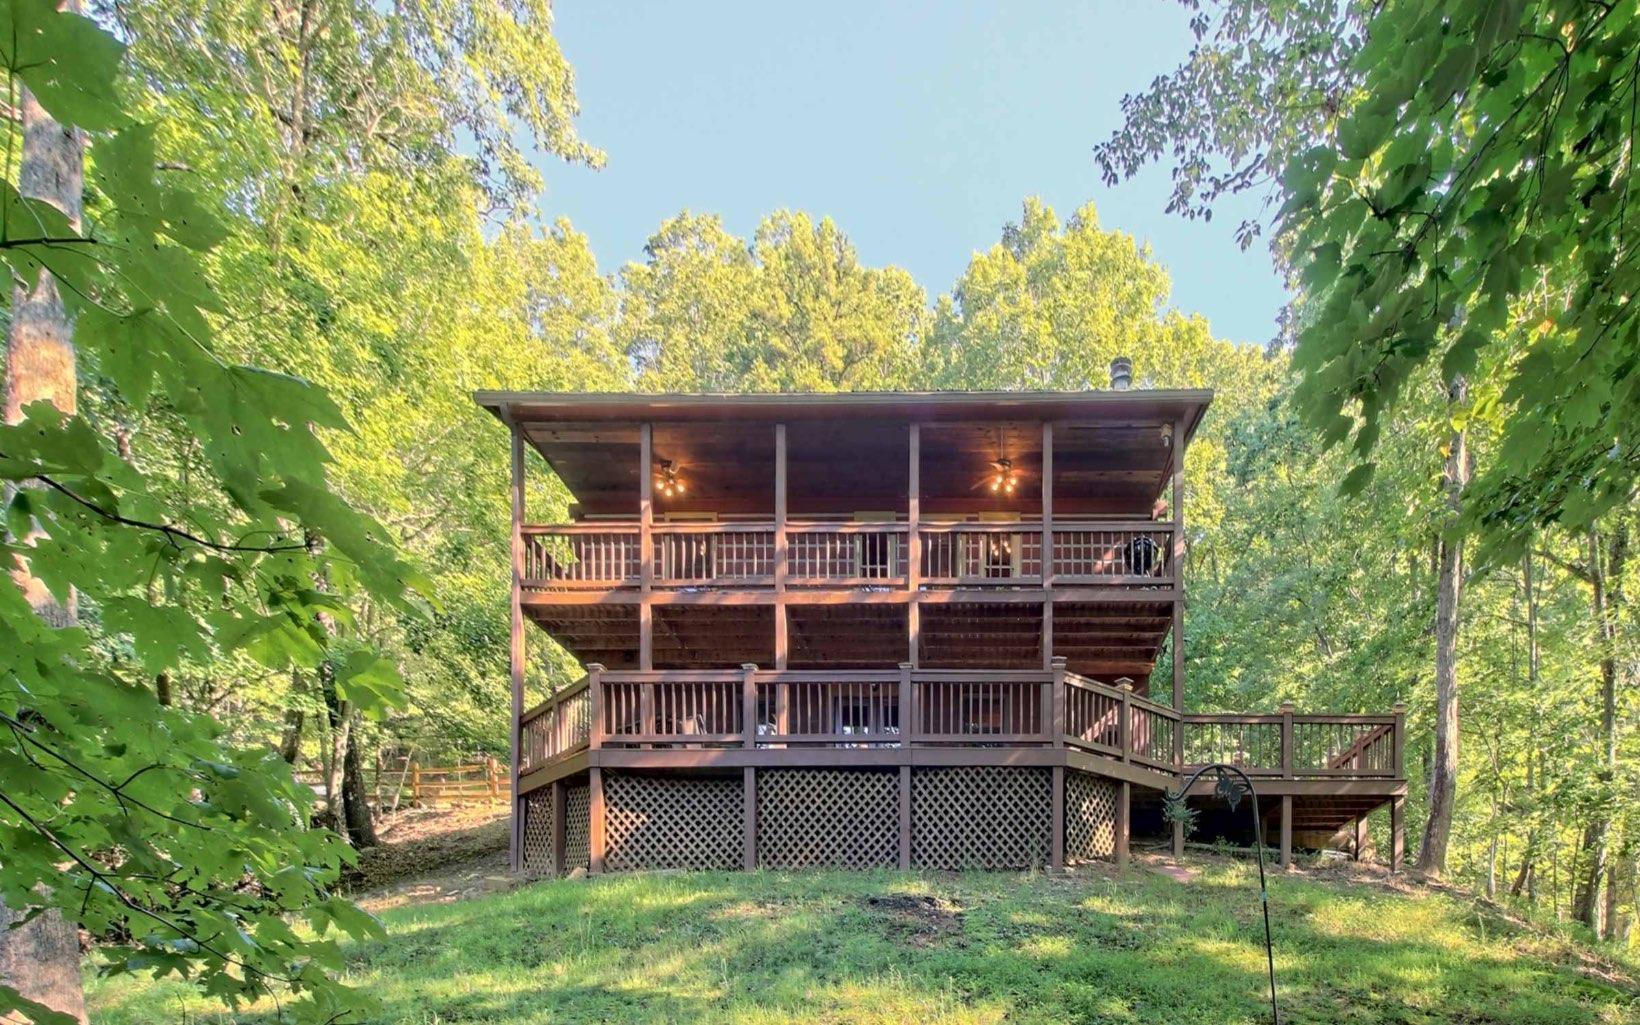 North Georgia Log Cabins for sale | North Georgia Mountain